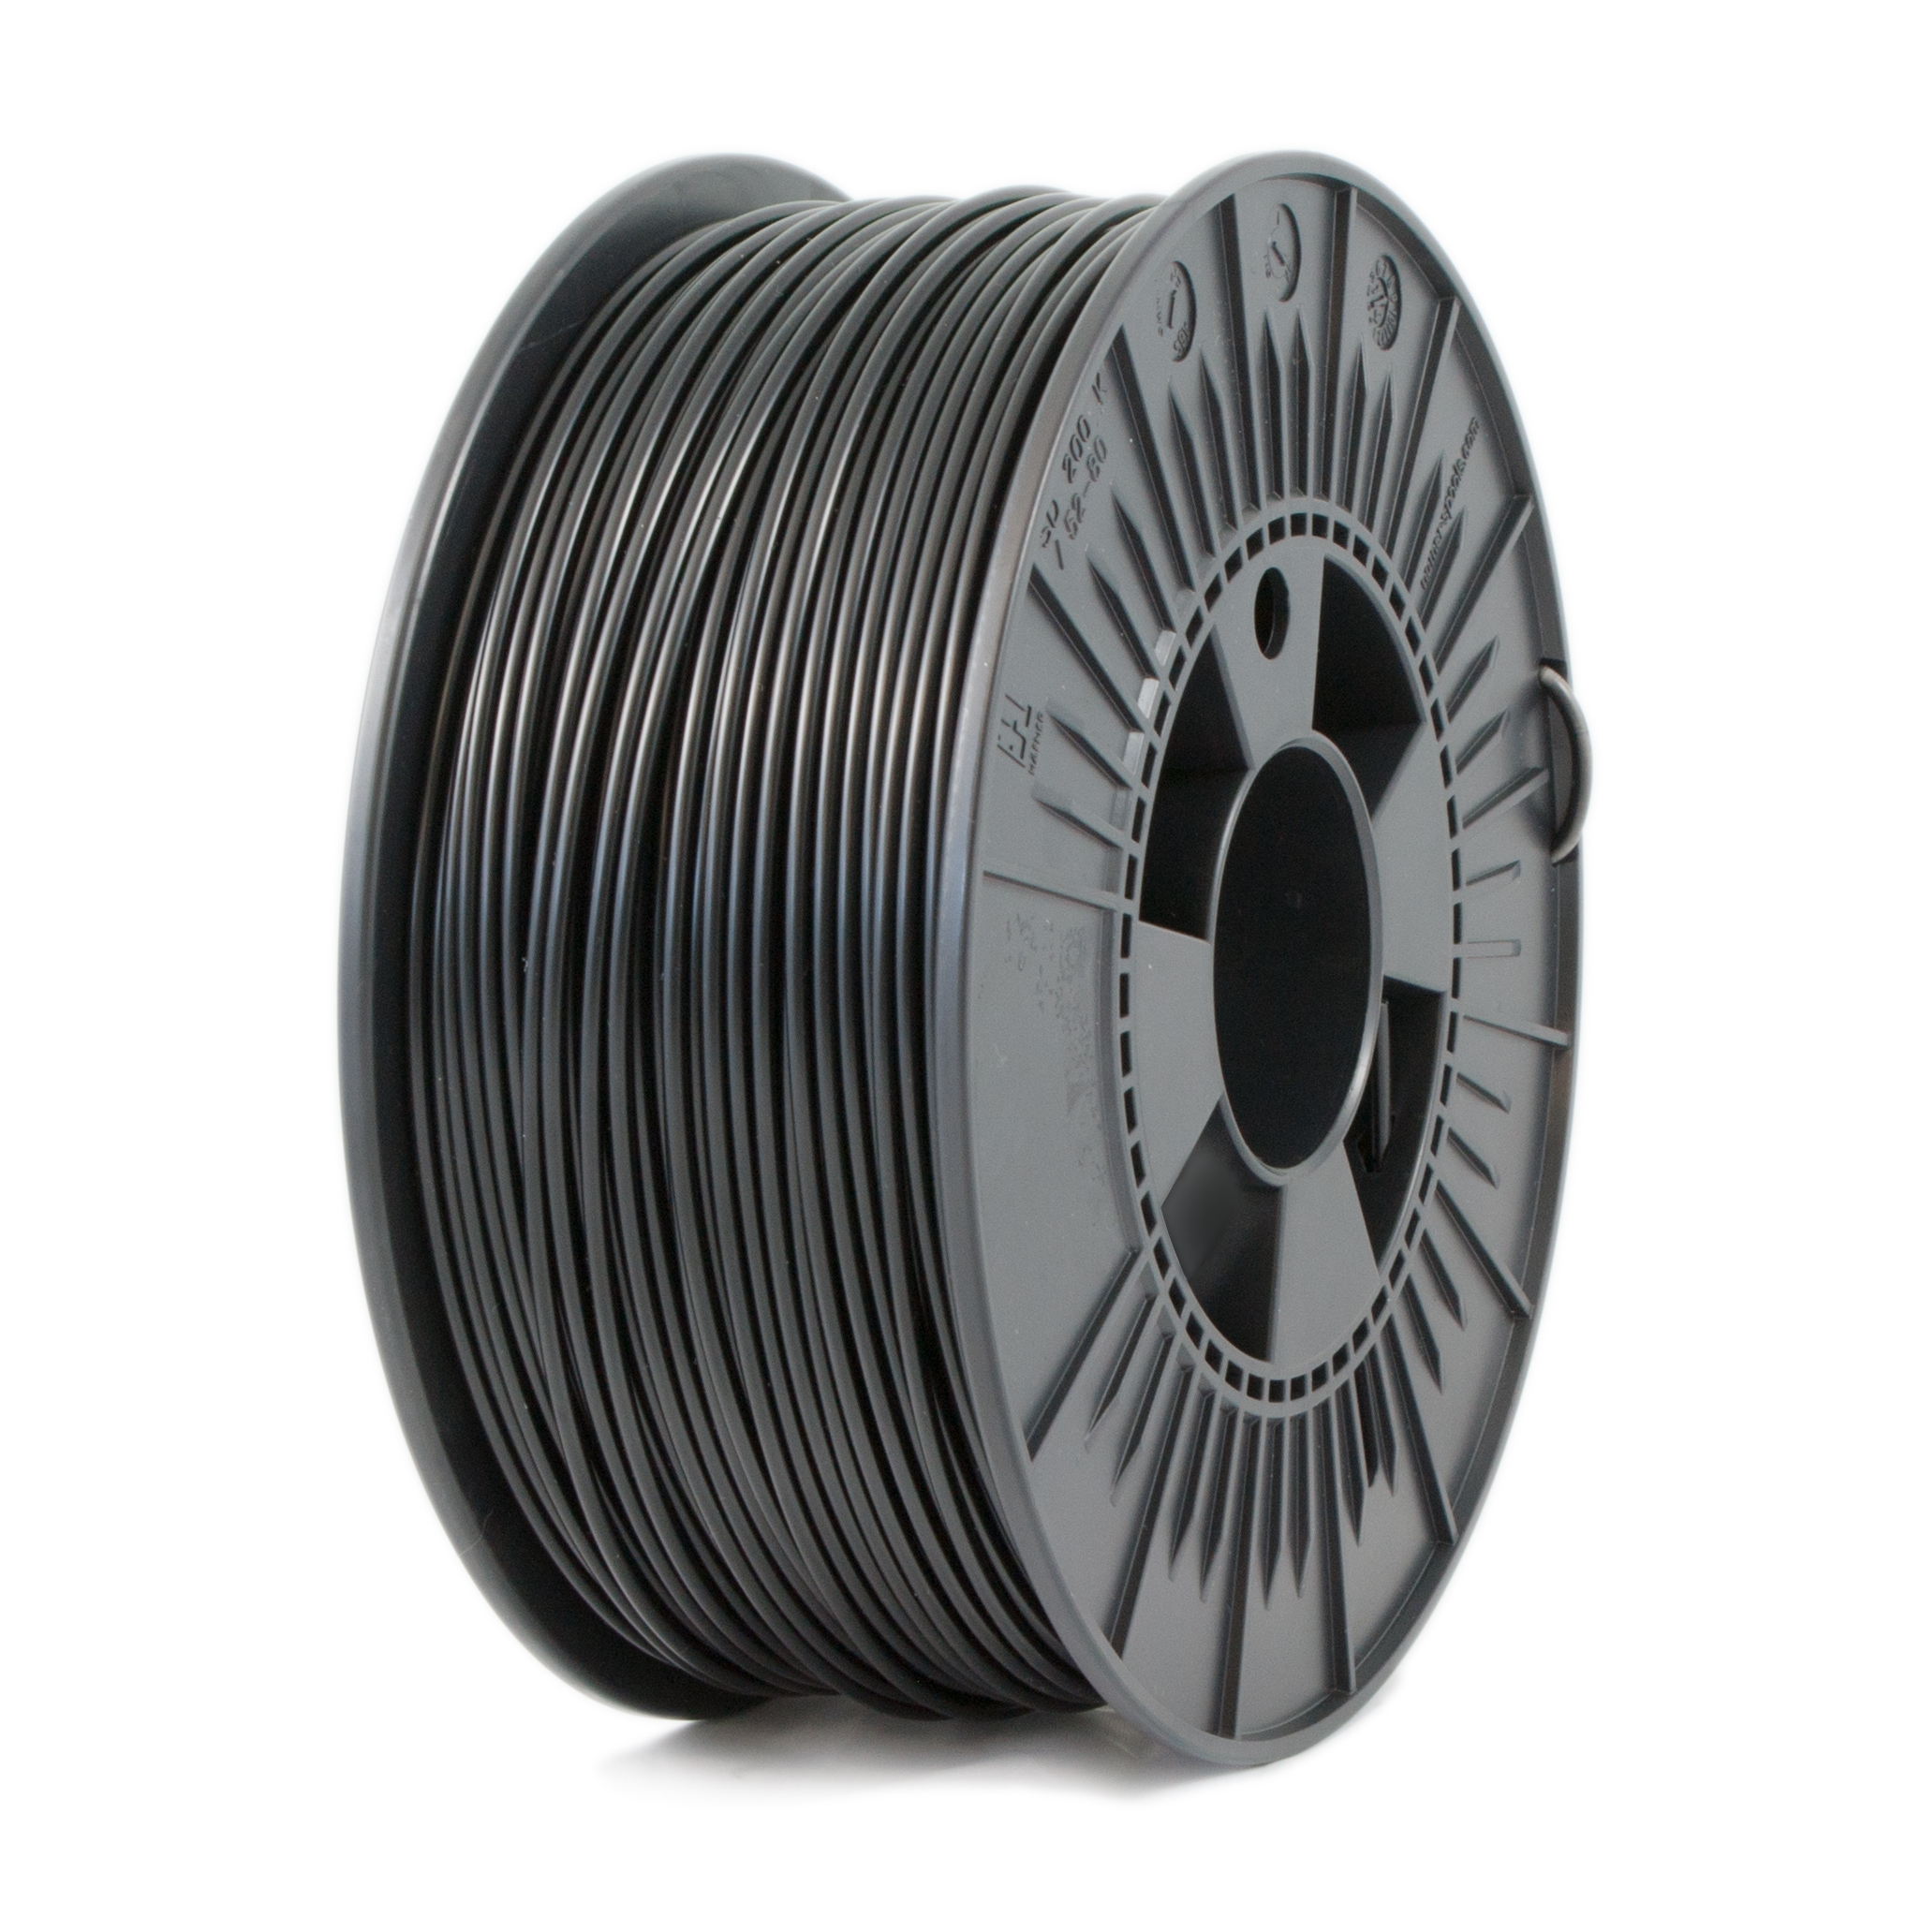 Filamentive  Black PLA 2.85 mm 4.5kg